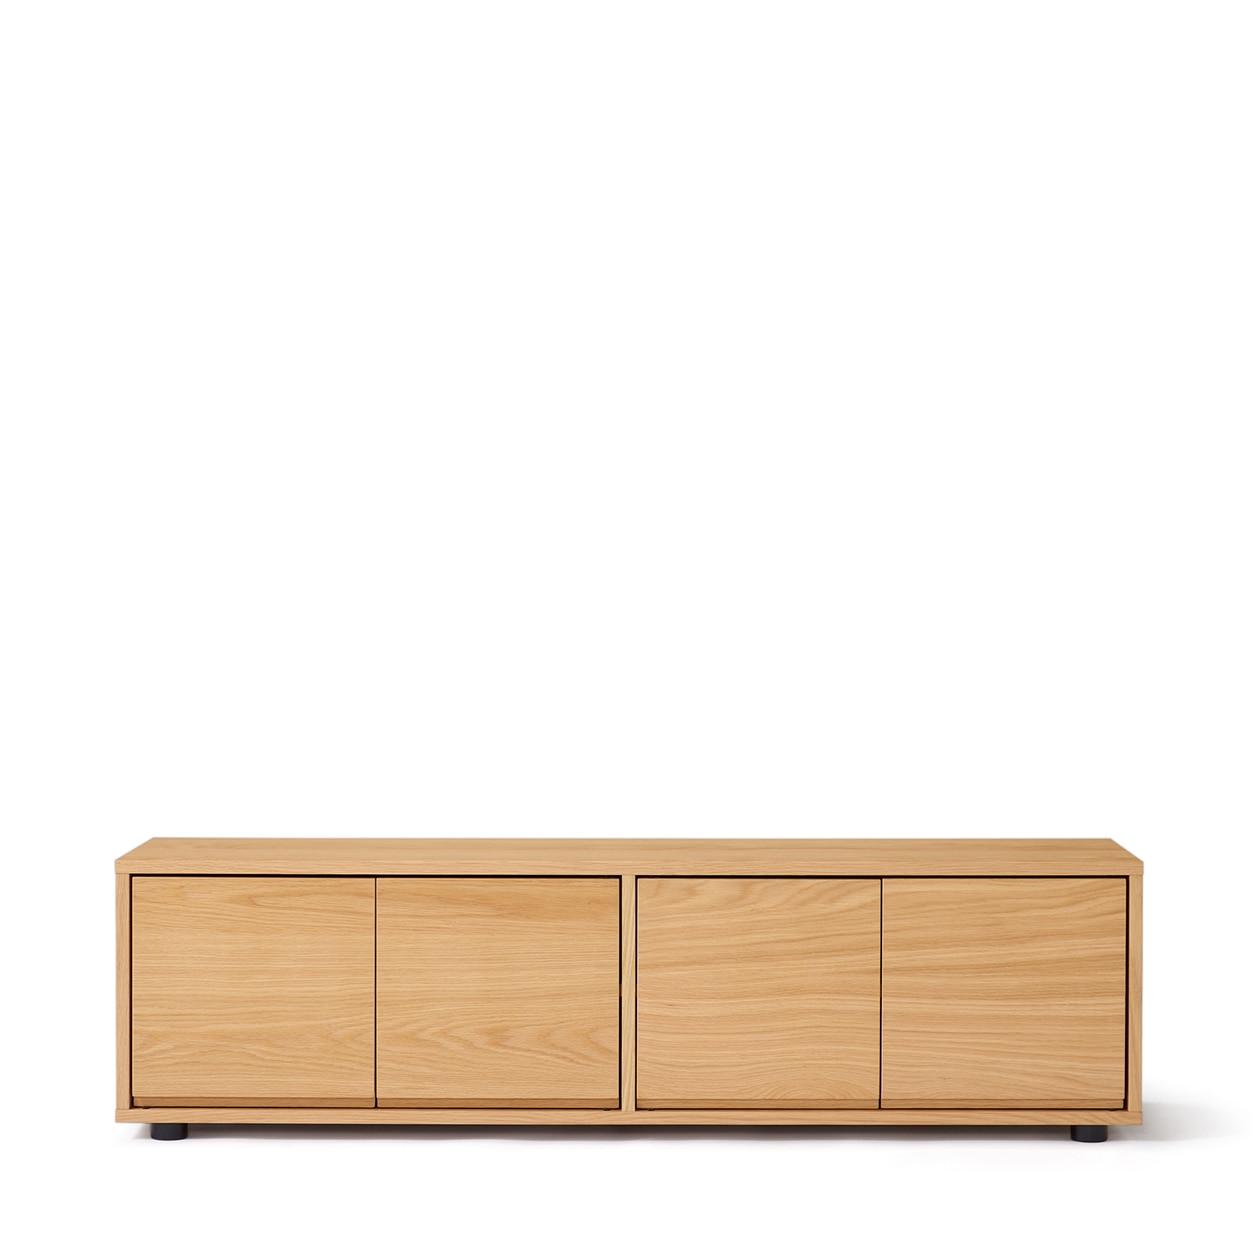 RoomClip商品情報 - スタッキングキャビネット・Bセット/オーク材